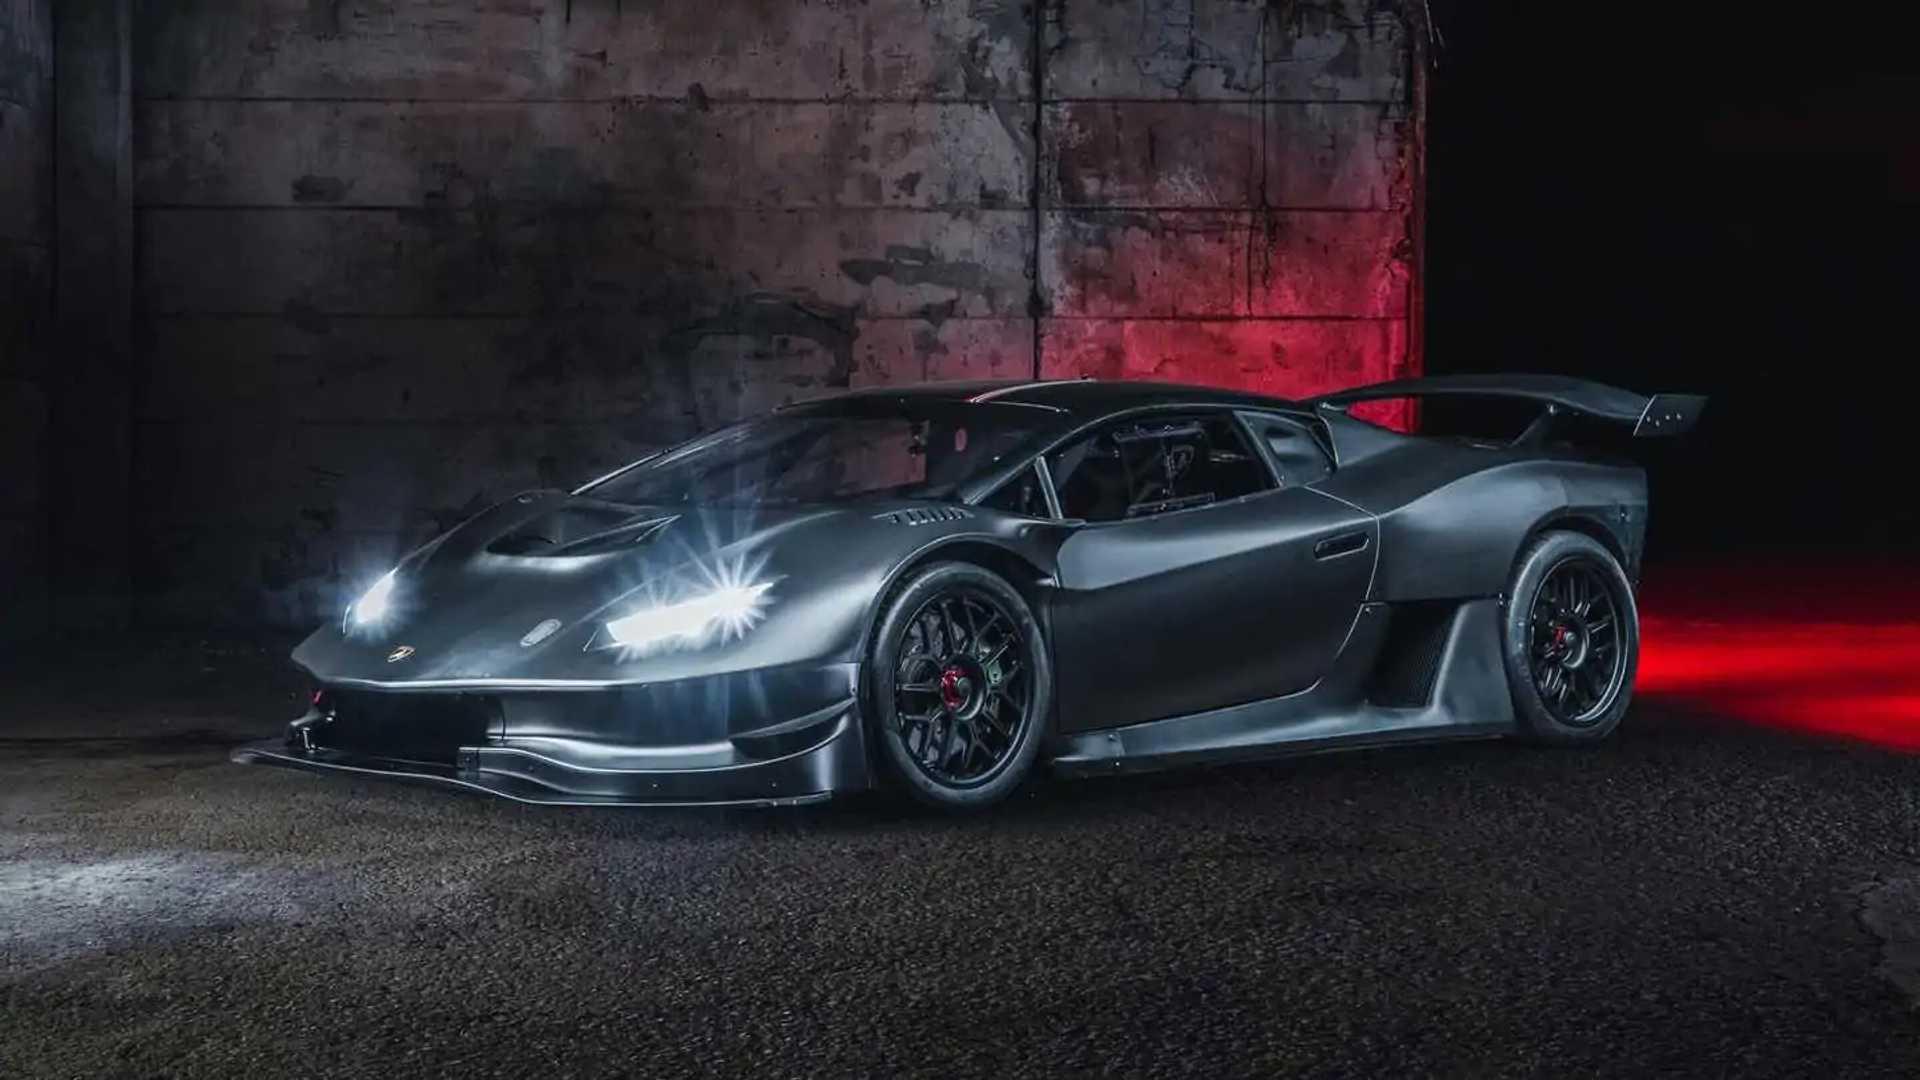 Este Zyrus LP1200 es un salvaje Lamborghini Huracán, con 1.200 CV